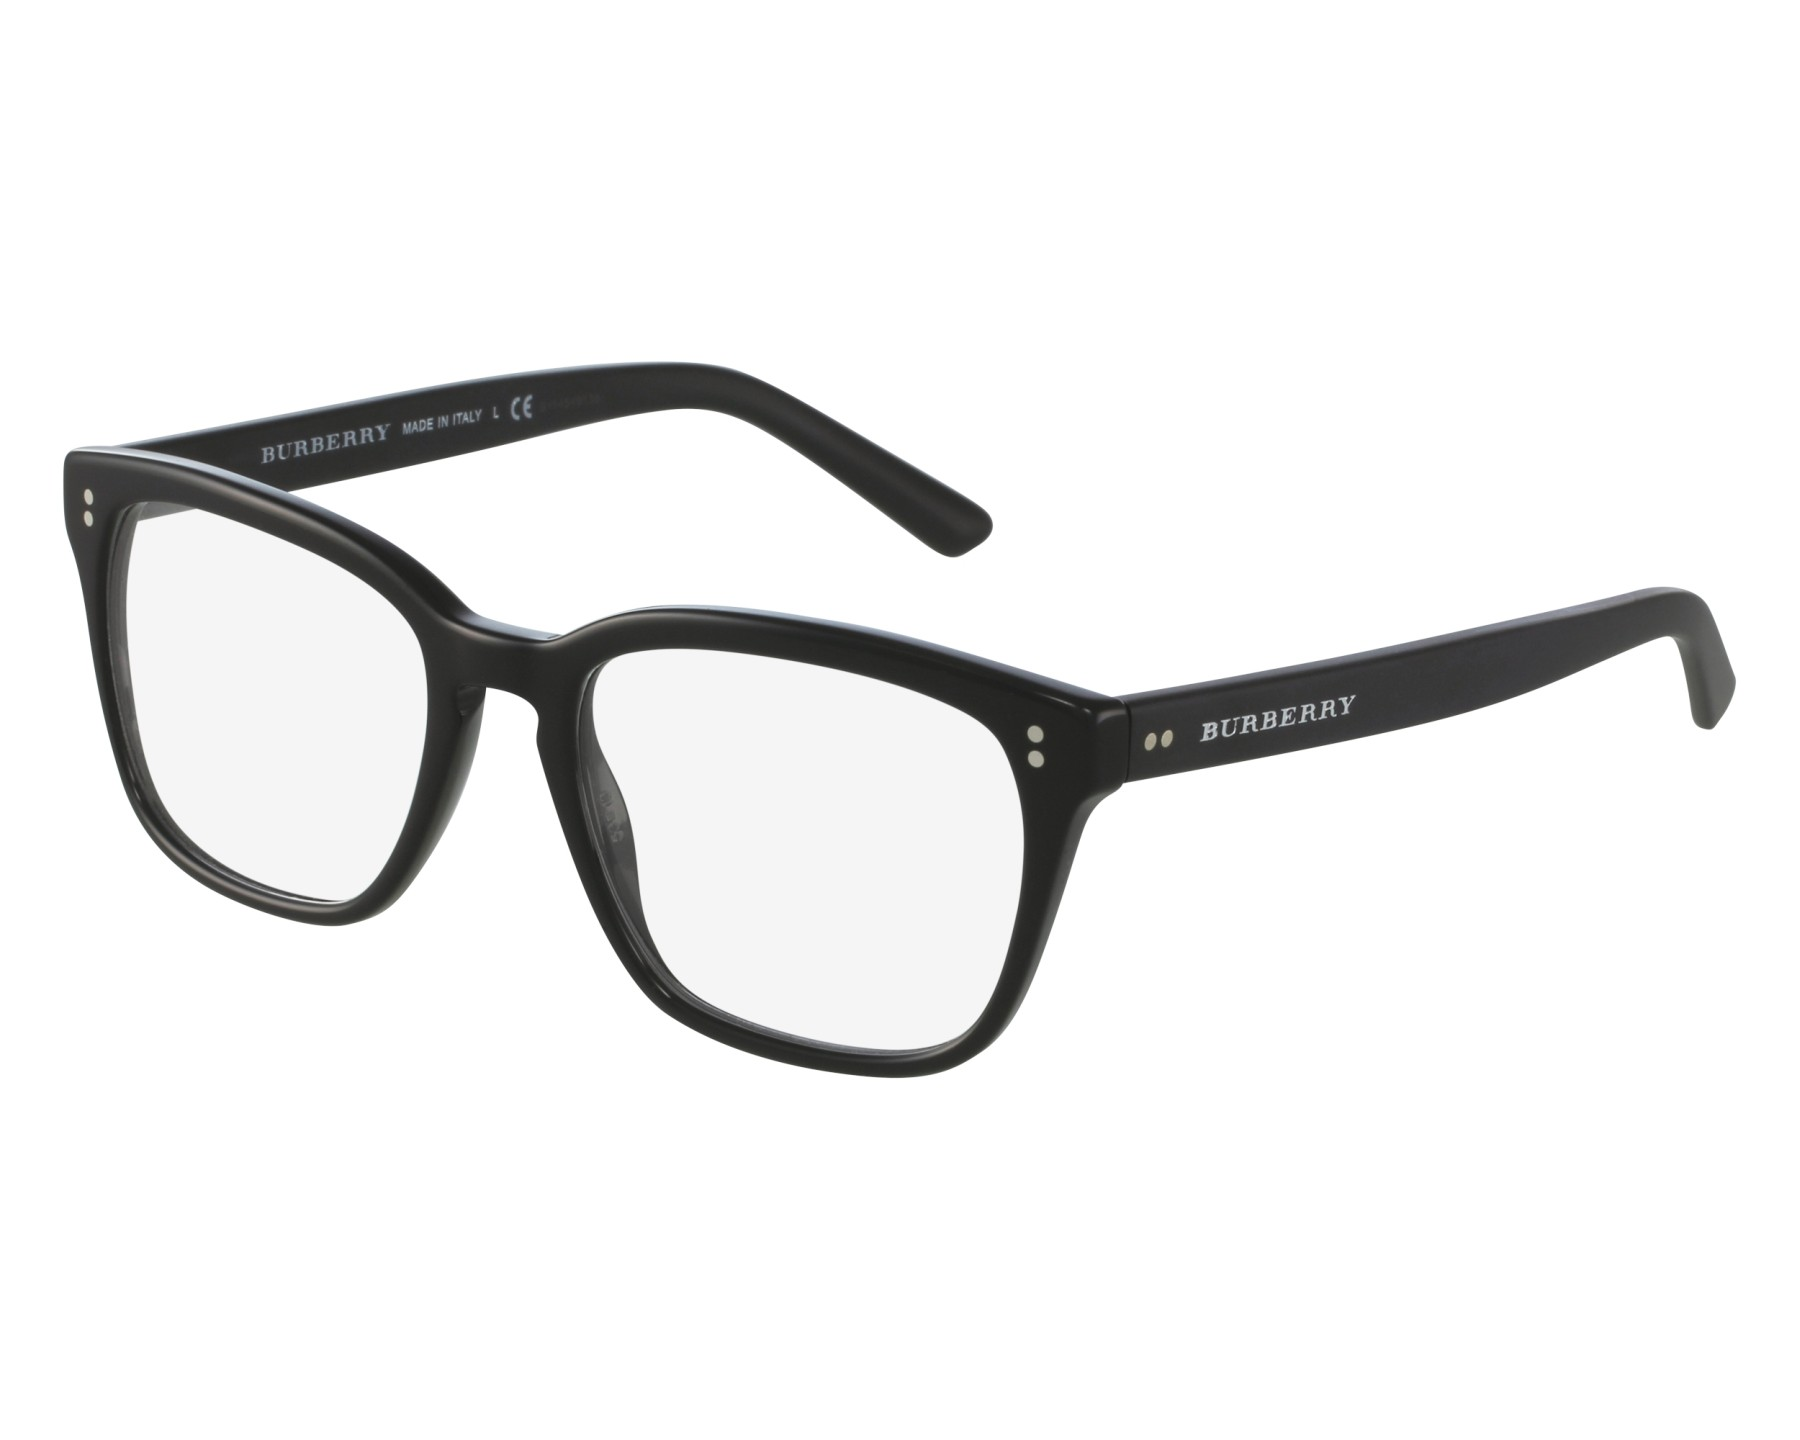 58a2e431e8eb eyeglasses Burberry BE-2225 3001 - Black Black front view